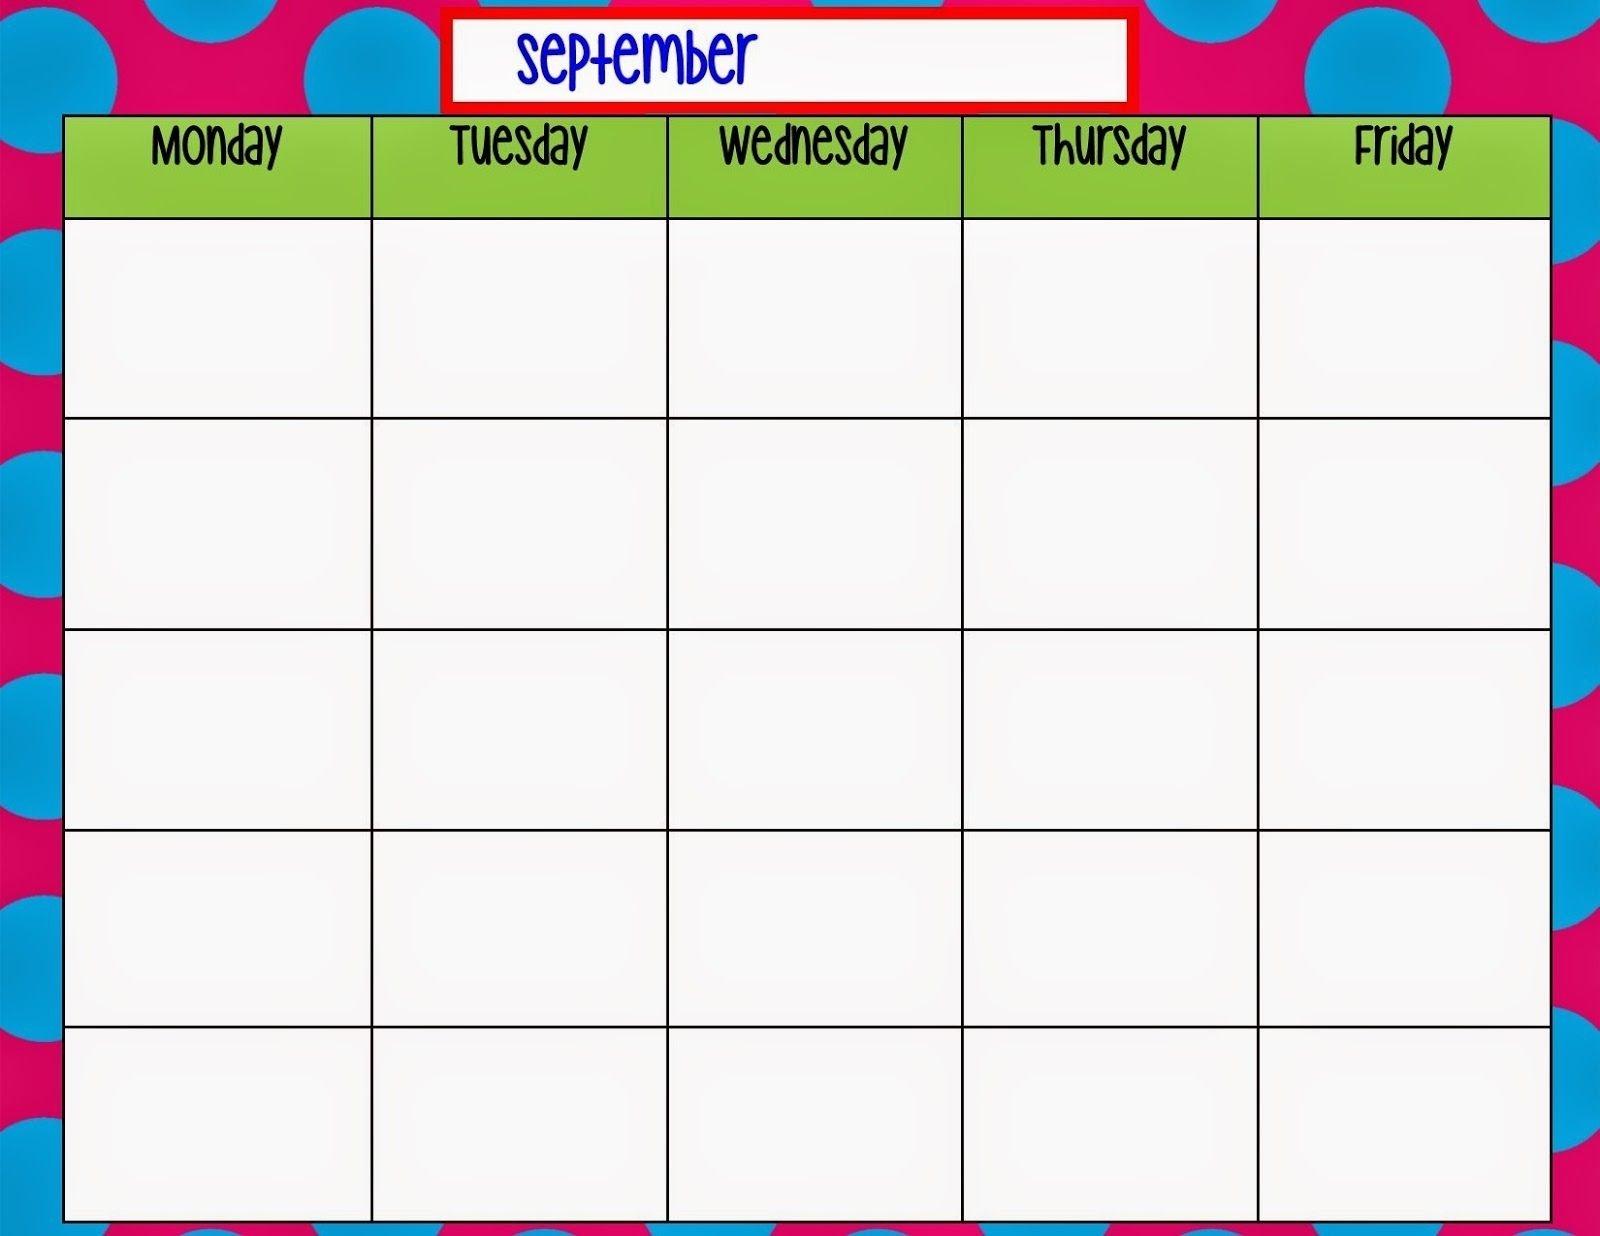 Monday Through Friday Schedule Printable – Calendar Monday Through Friday Calendar Printable